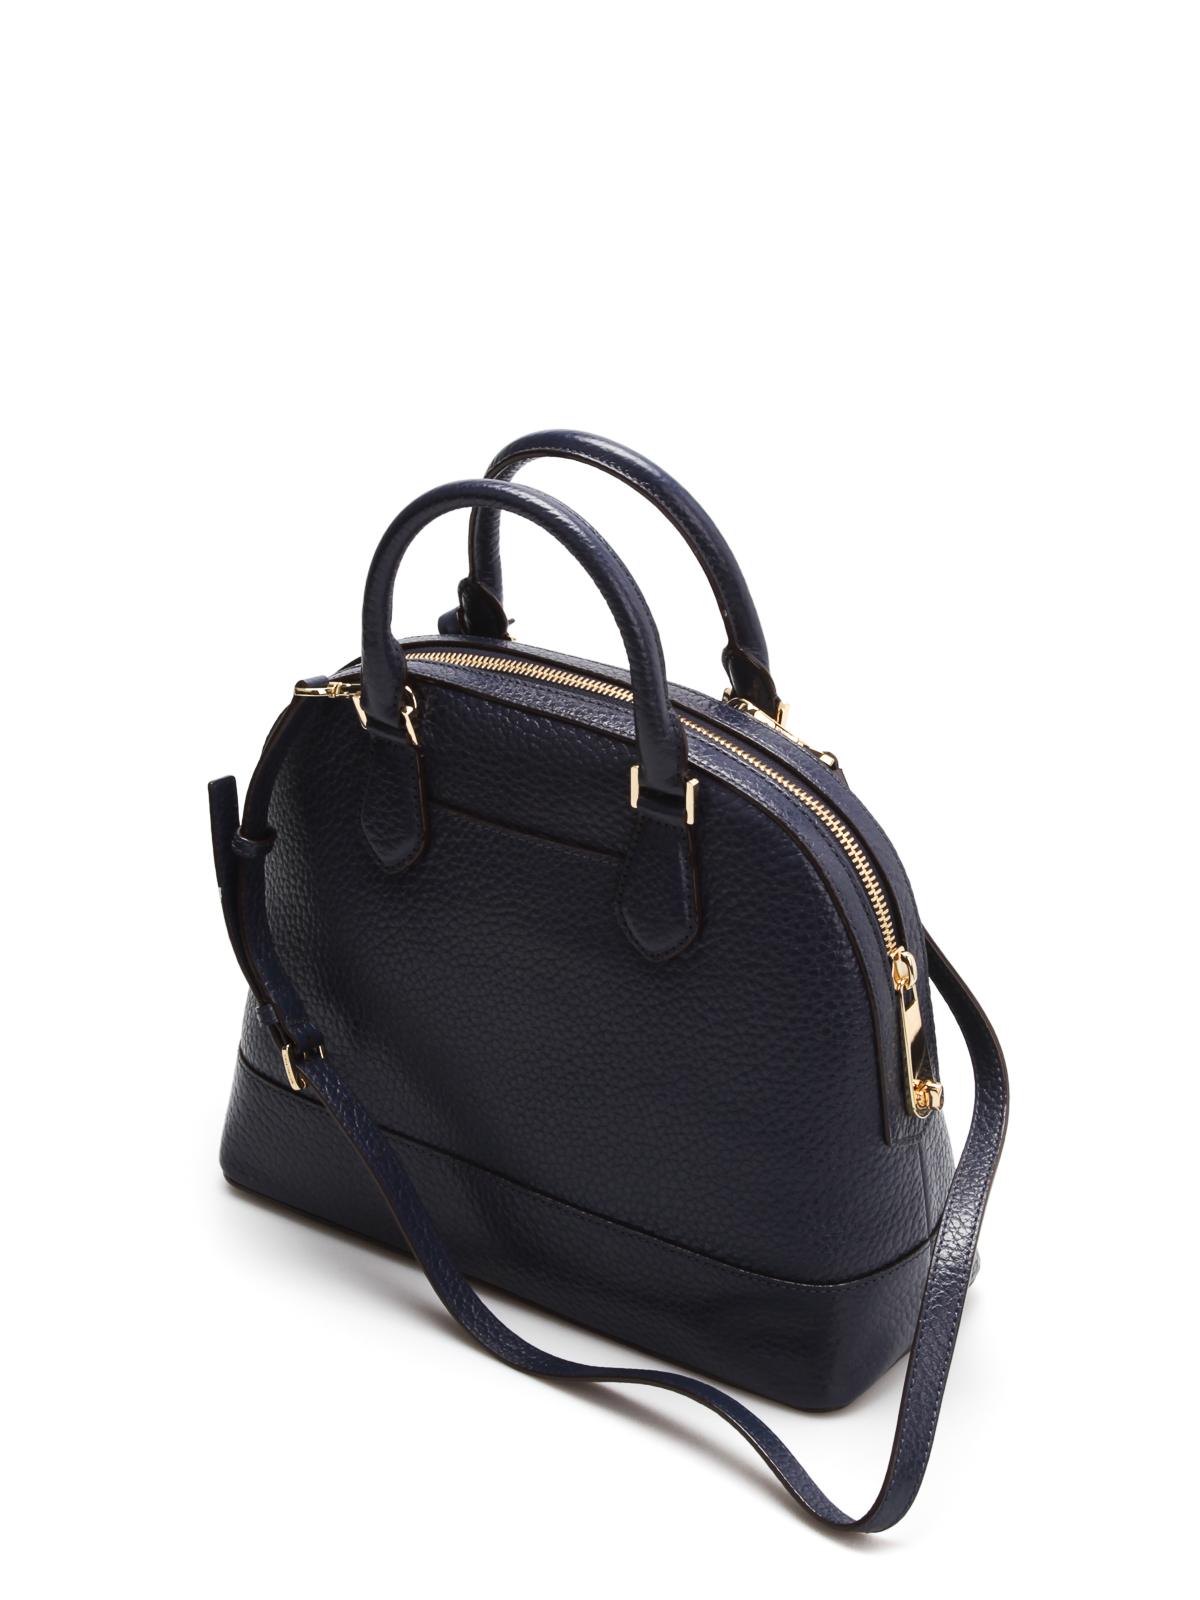 e61ec54dee08 Michael Kors - Smythe large leather handbag - bowling bags - 30T5GSOS3E